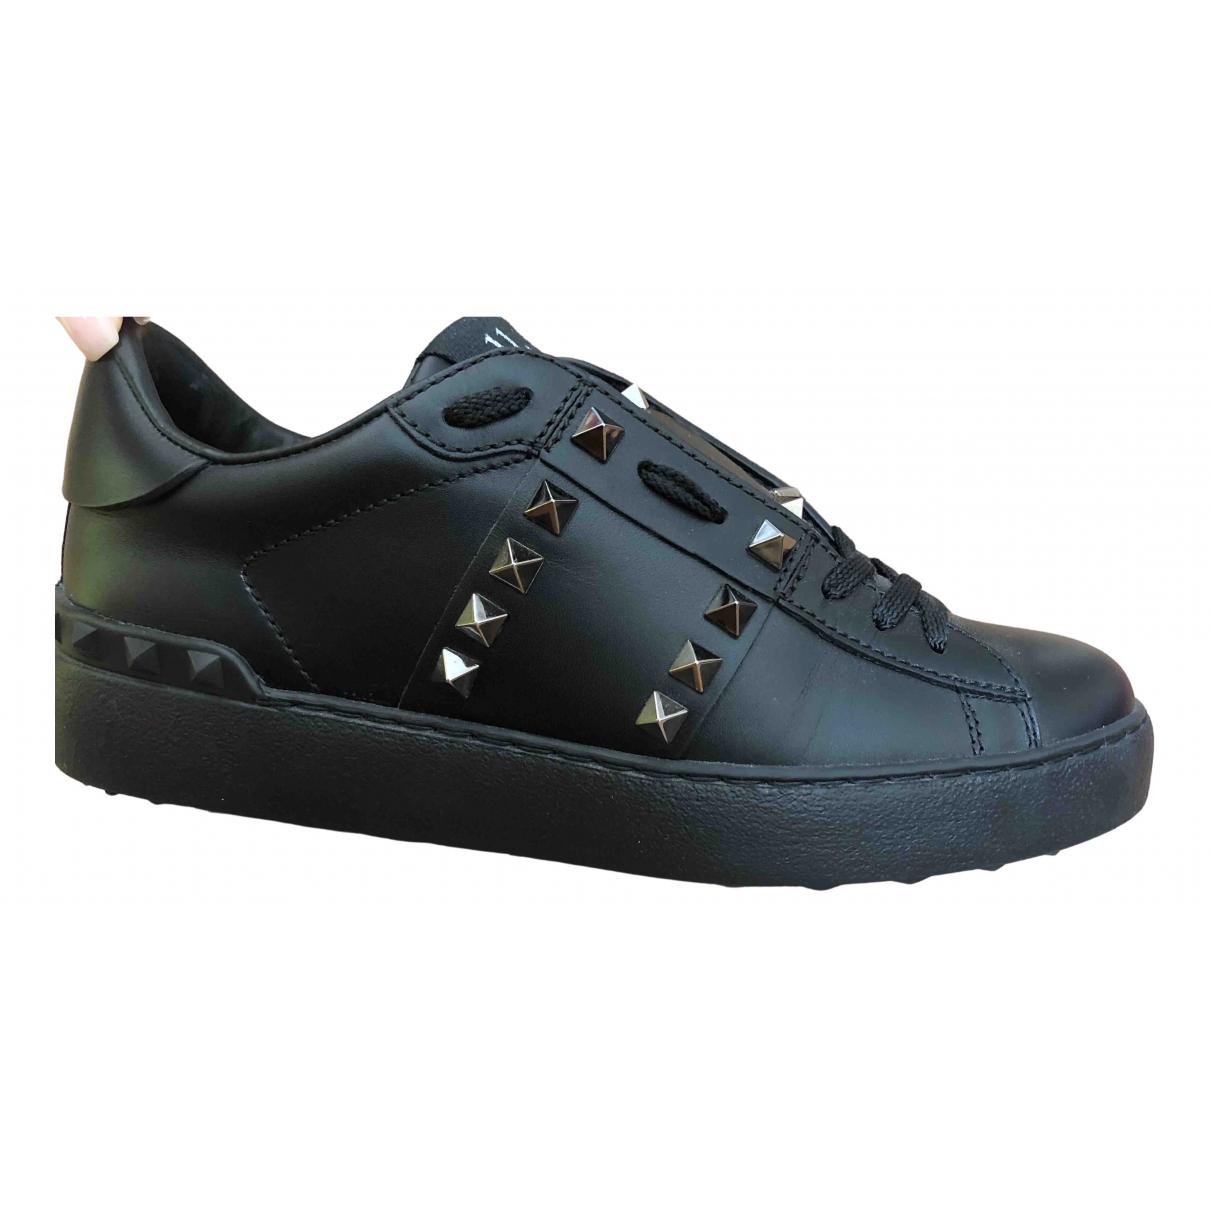 Valentino Garavani Sneakers chaussettes VLTN  Black Leather Trainers for Women 36.5 EU